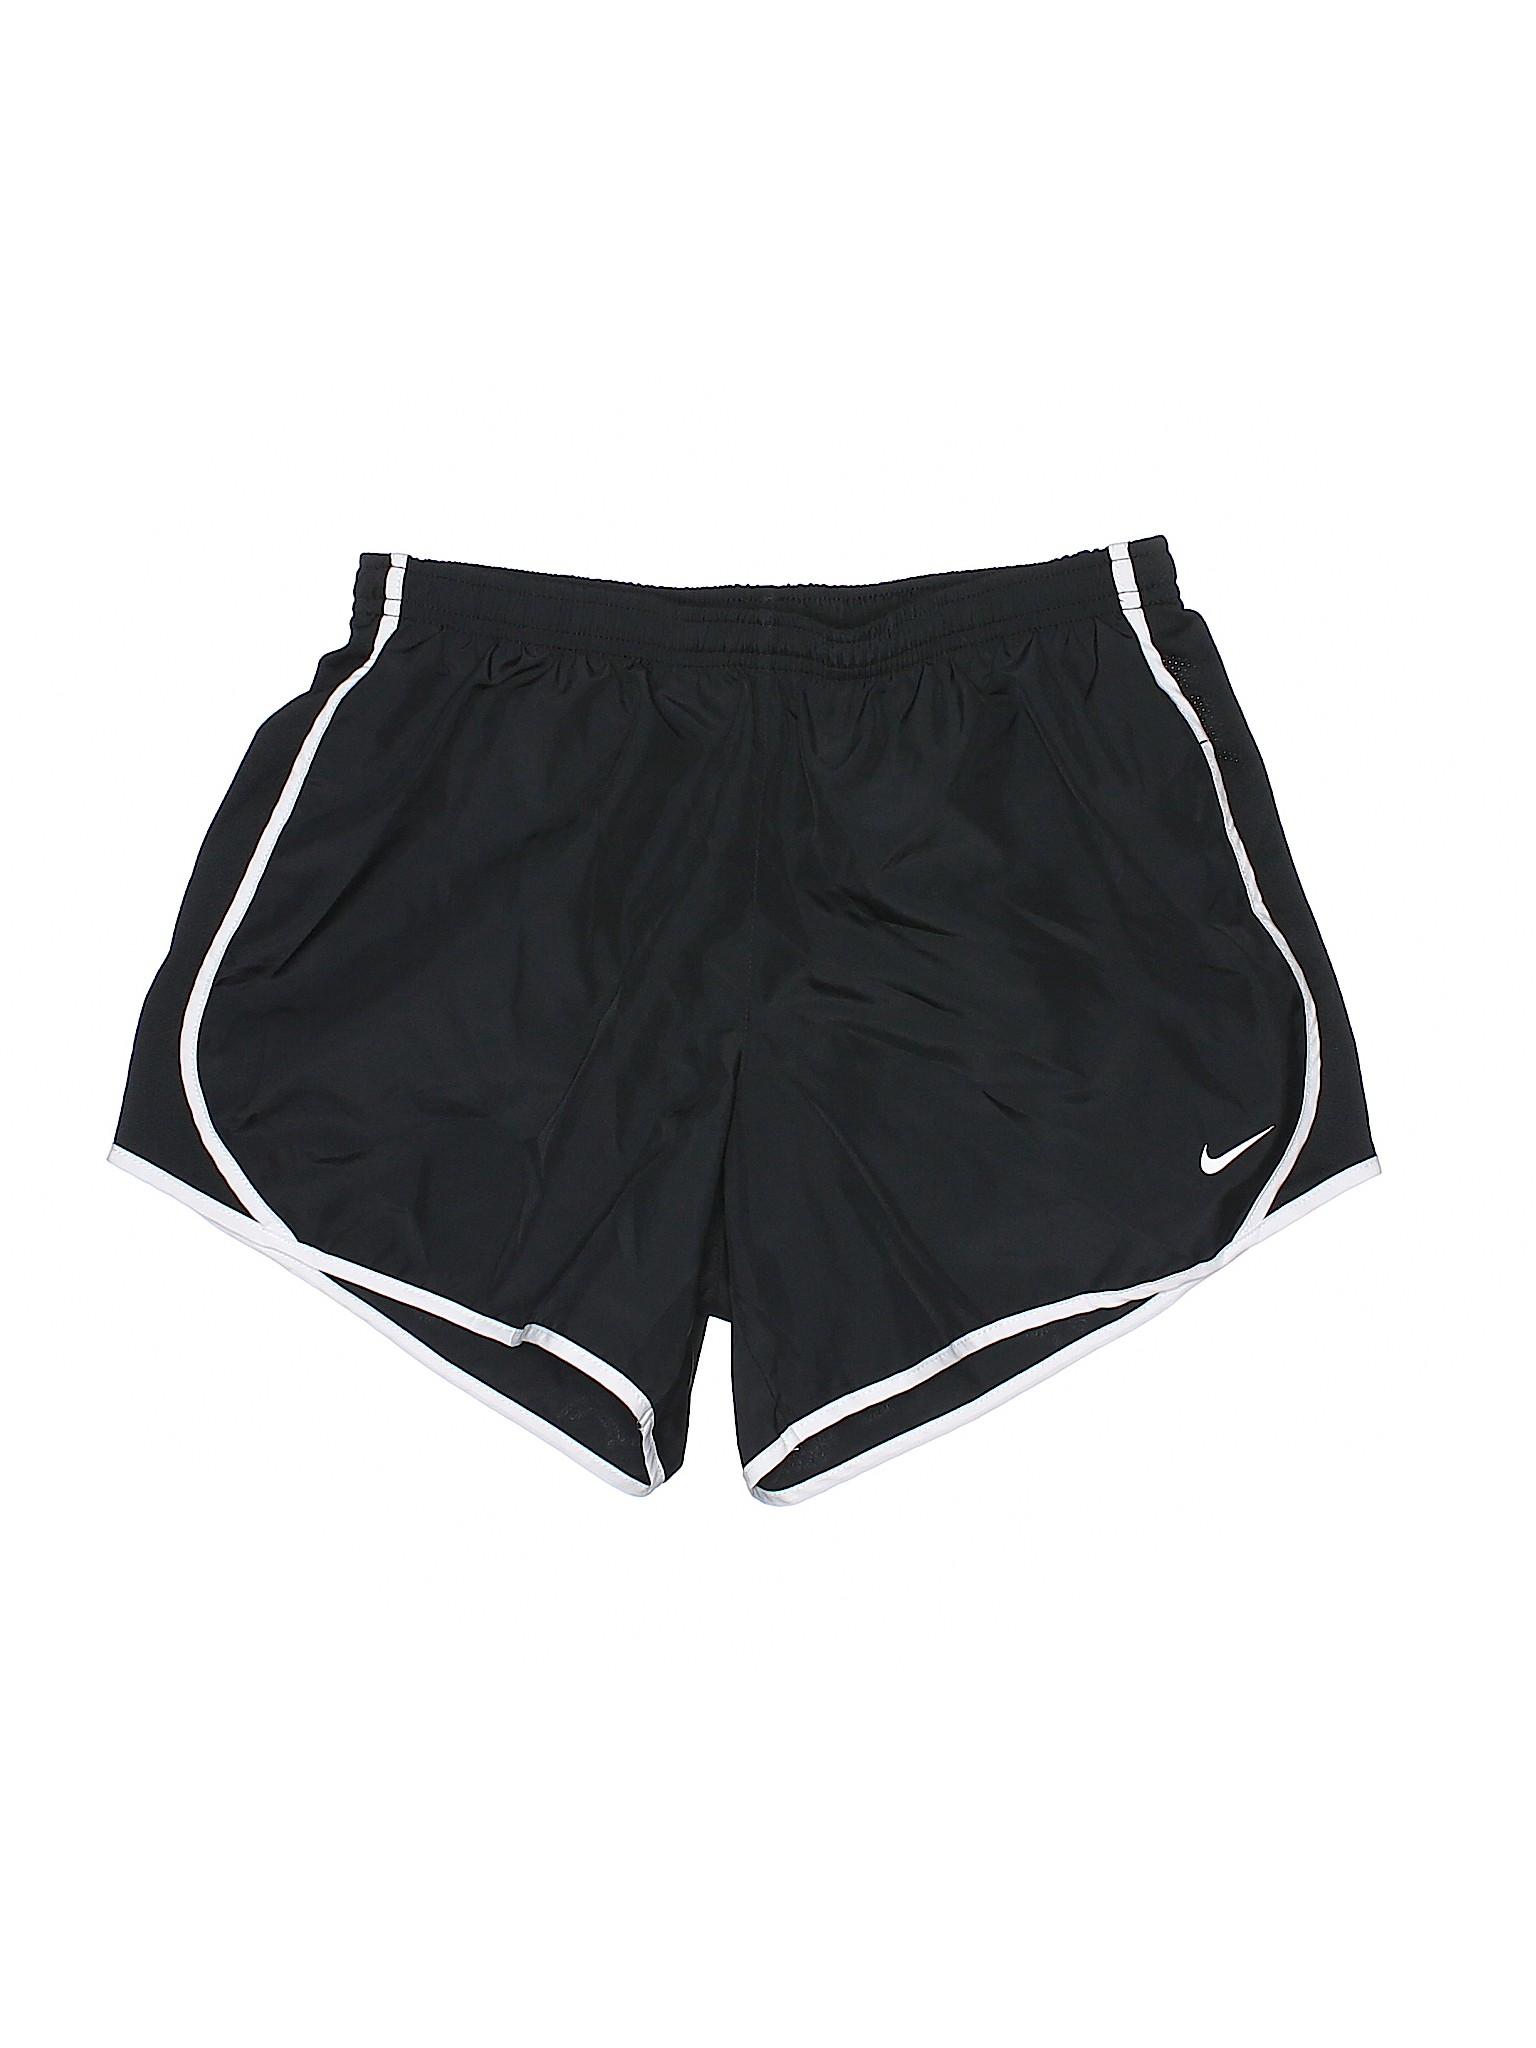 Athletic Nike Boutique Shorts Nike Boutique Shorts Nike Athletic Boutique wBBIvqxH